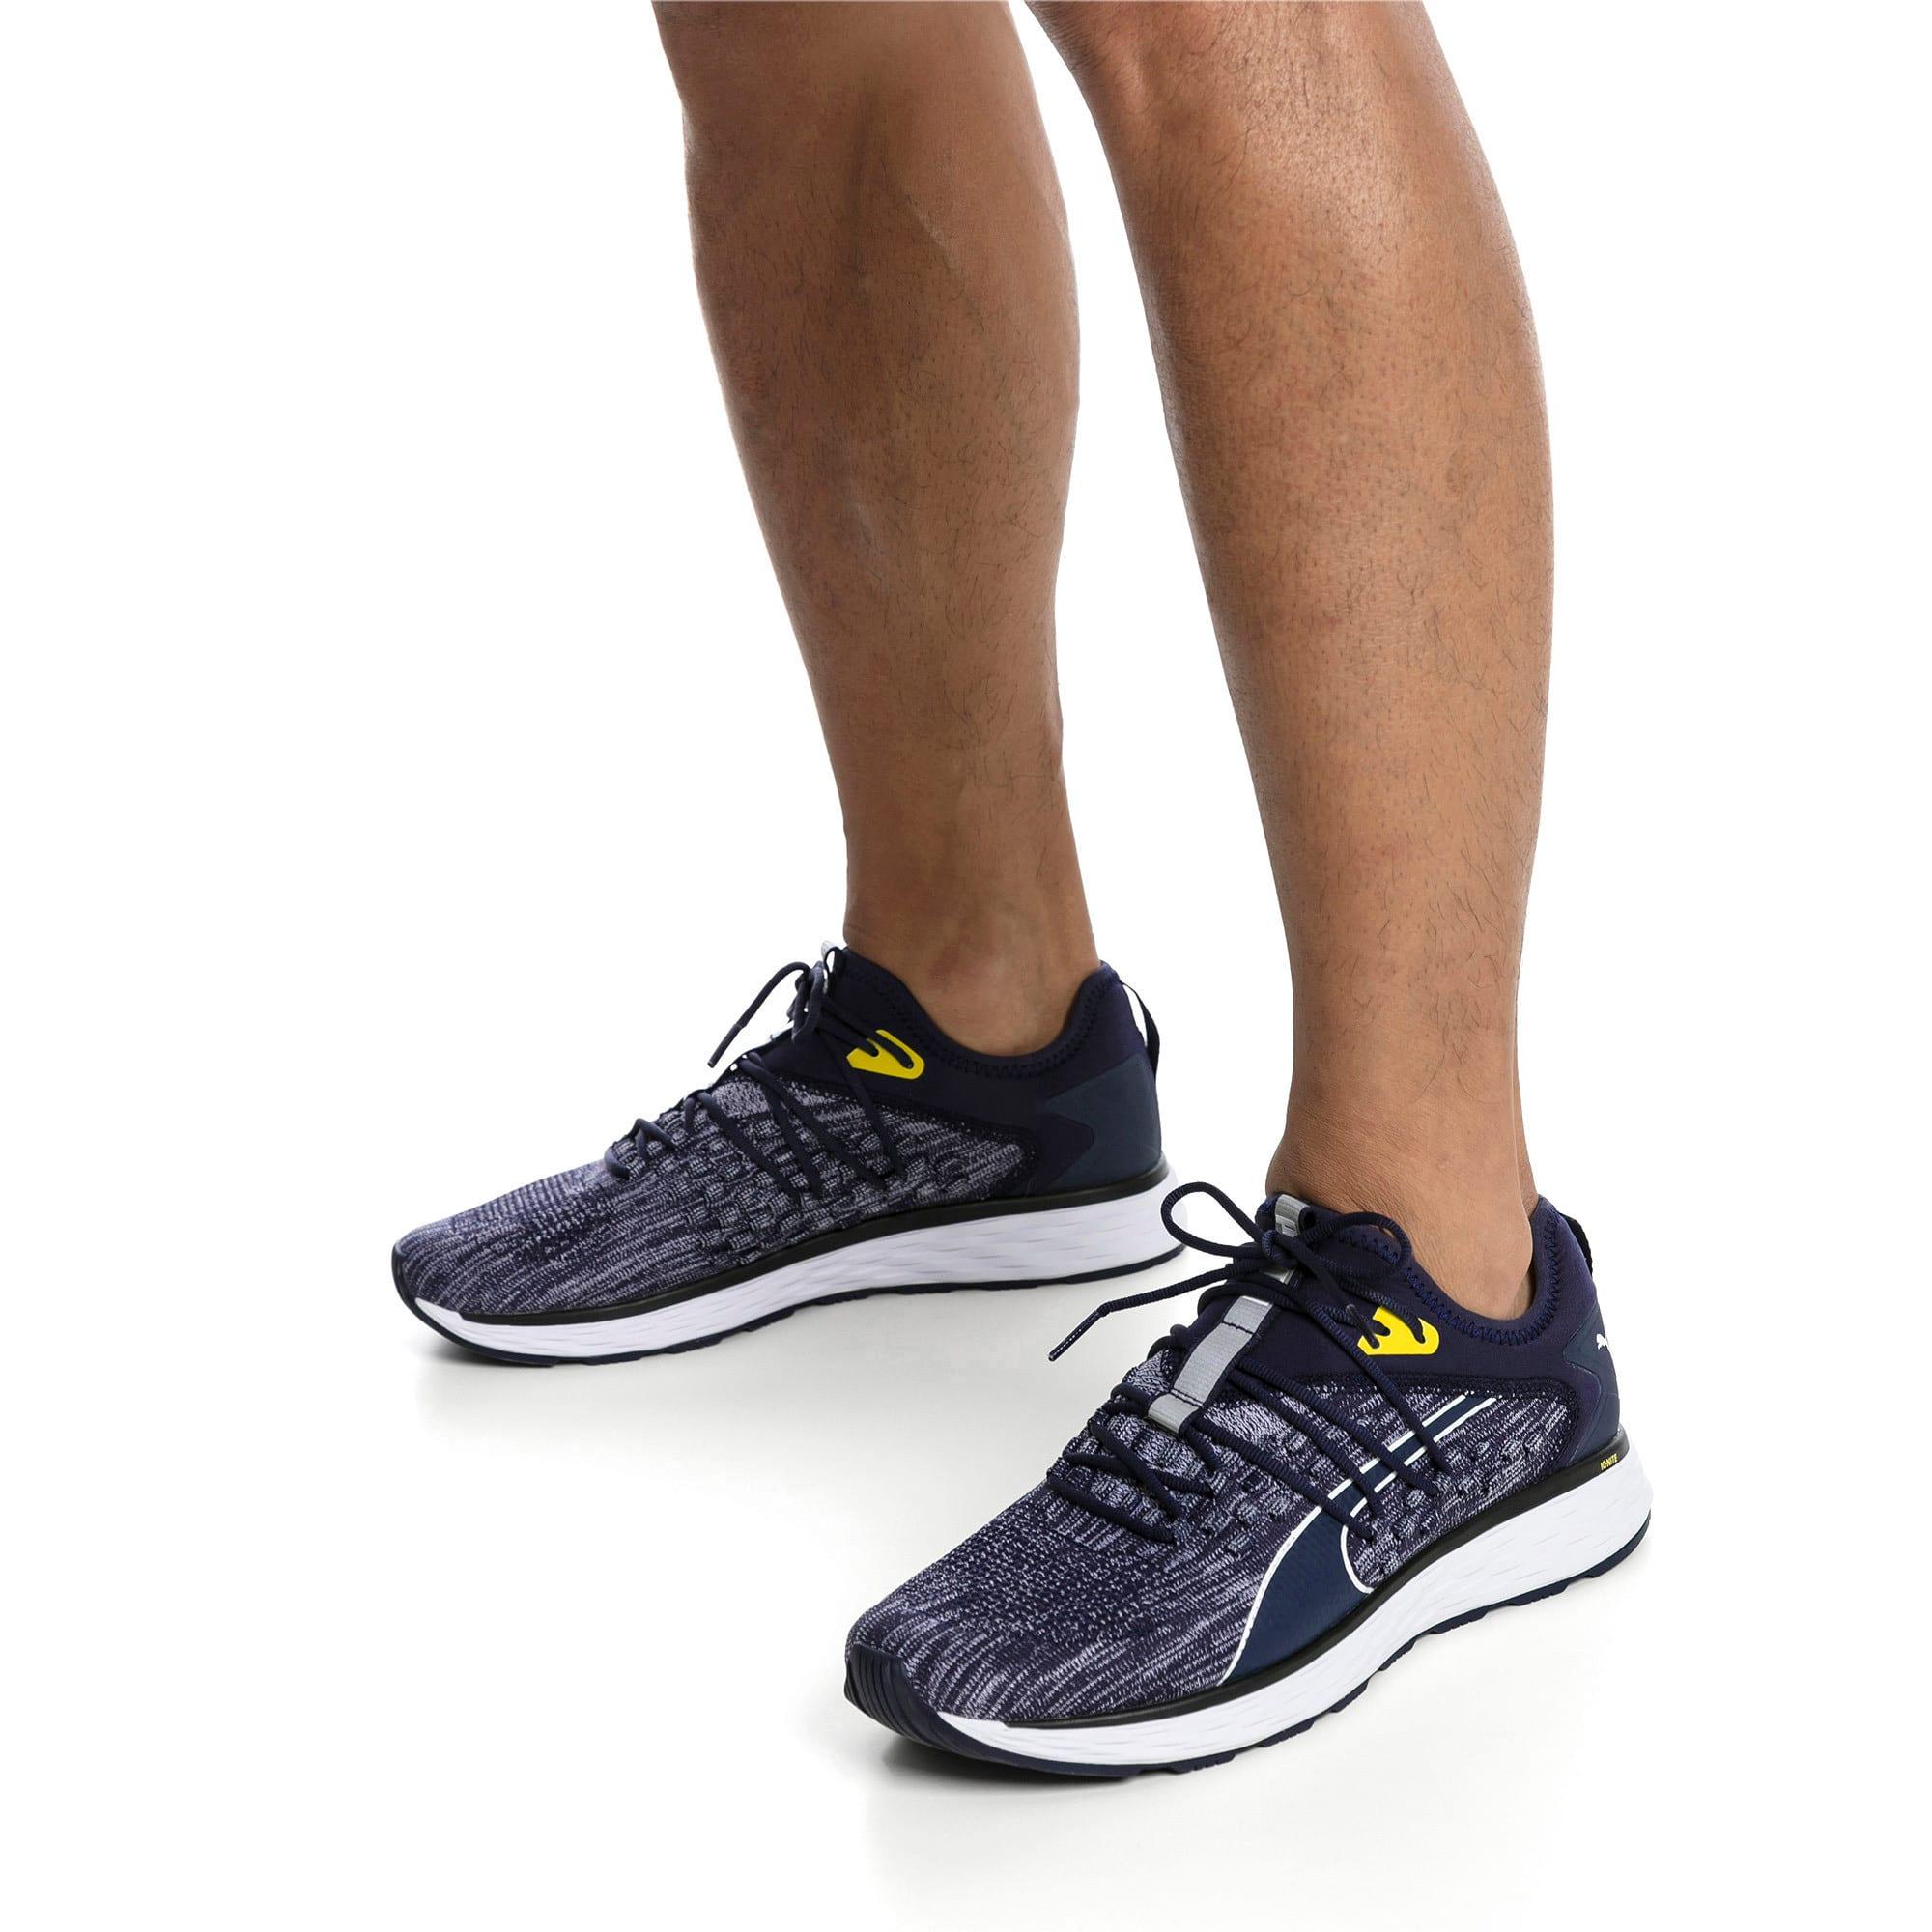 Thumbnail 2 of SPEED FUSEFIT Men's Running Shoes, Peacoat-White-Blazing Yellow, medium-IND